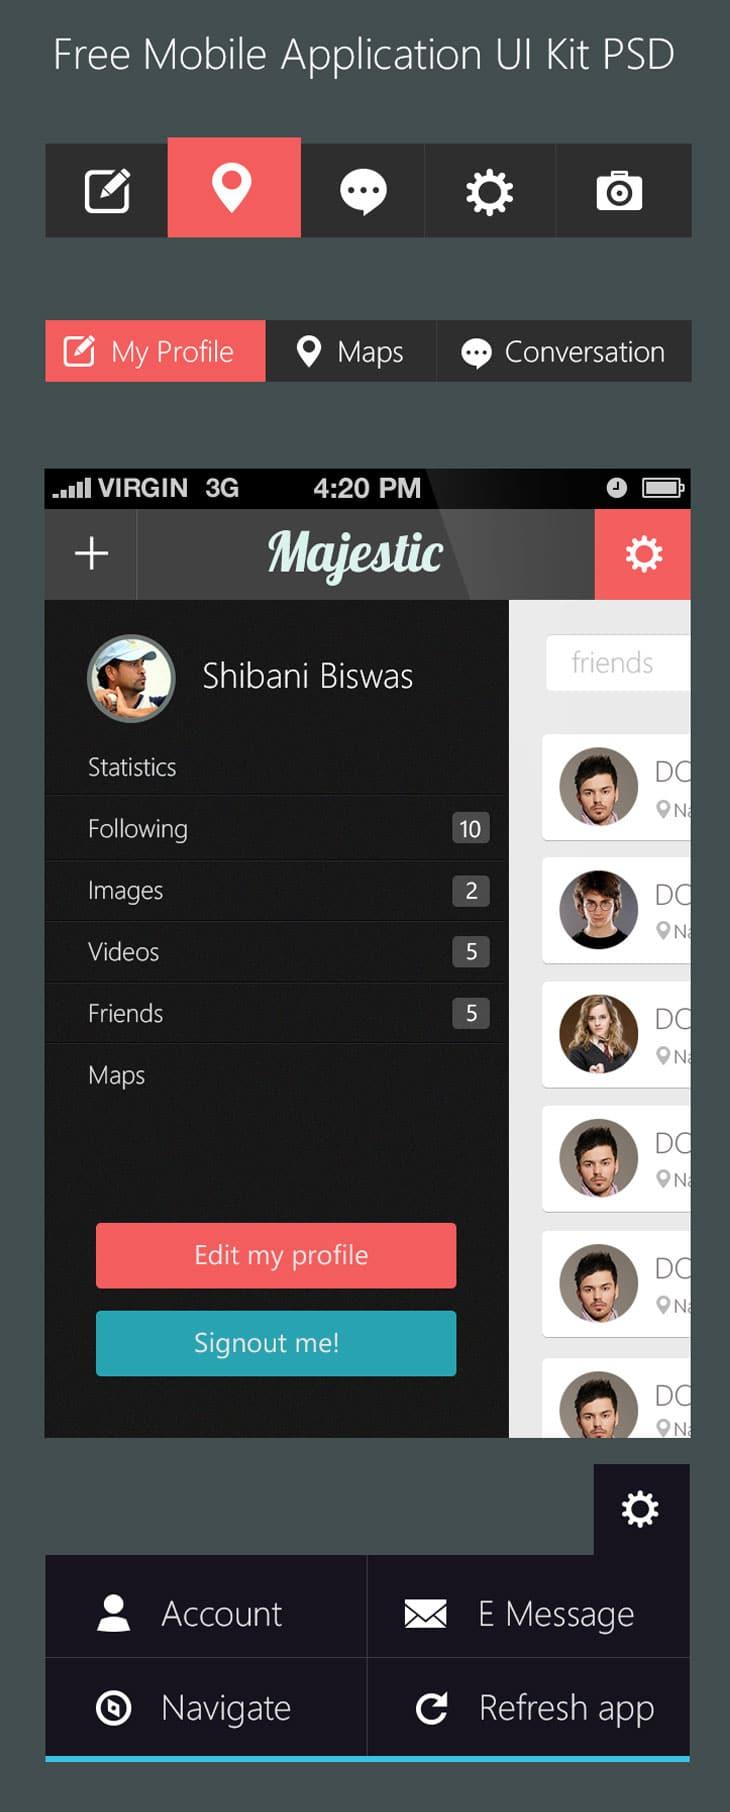 Free-Mobile-Application-UI-Kit